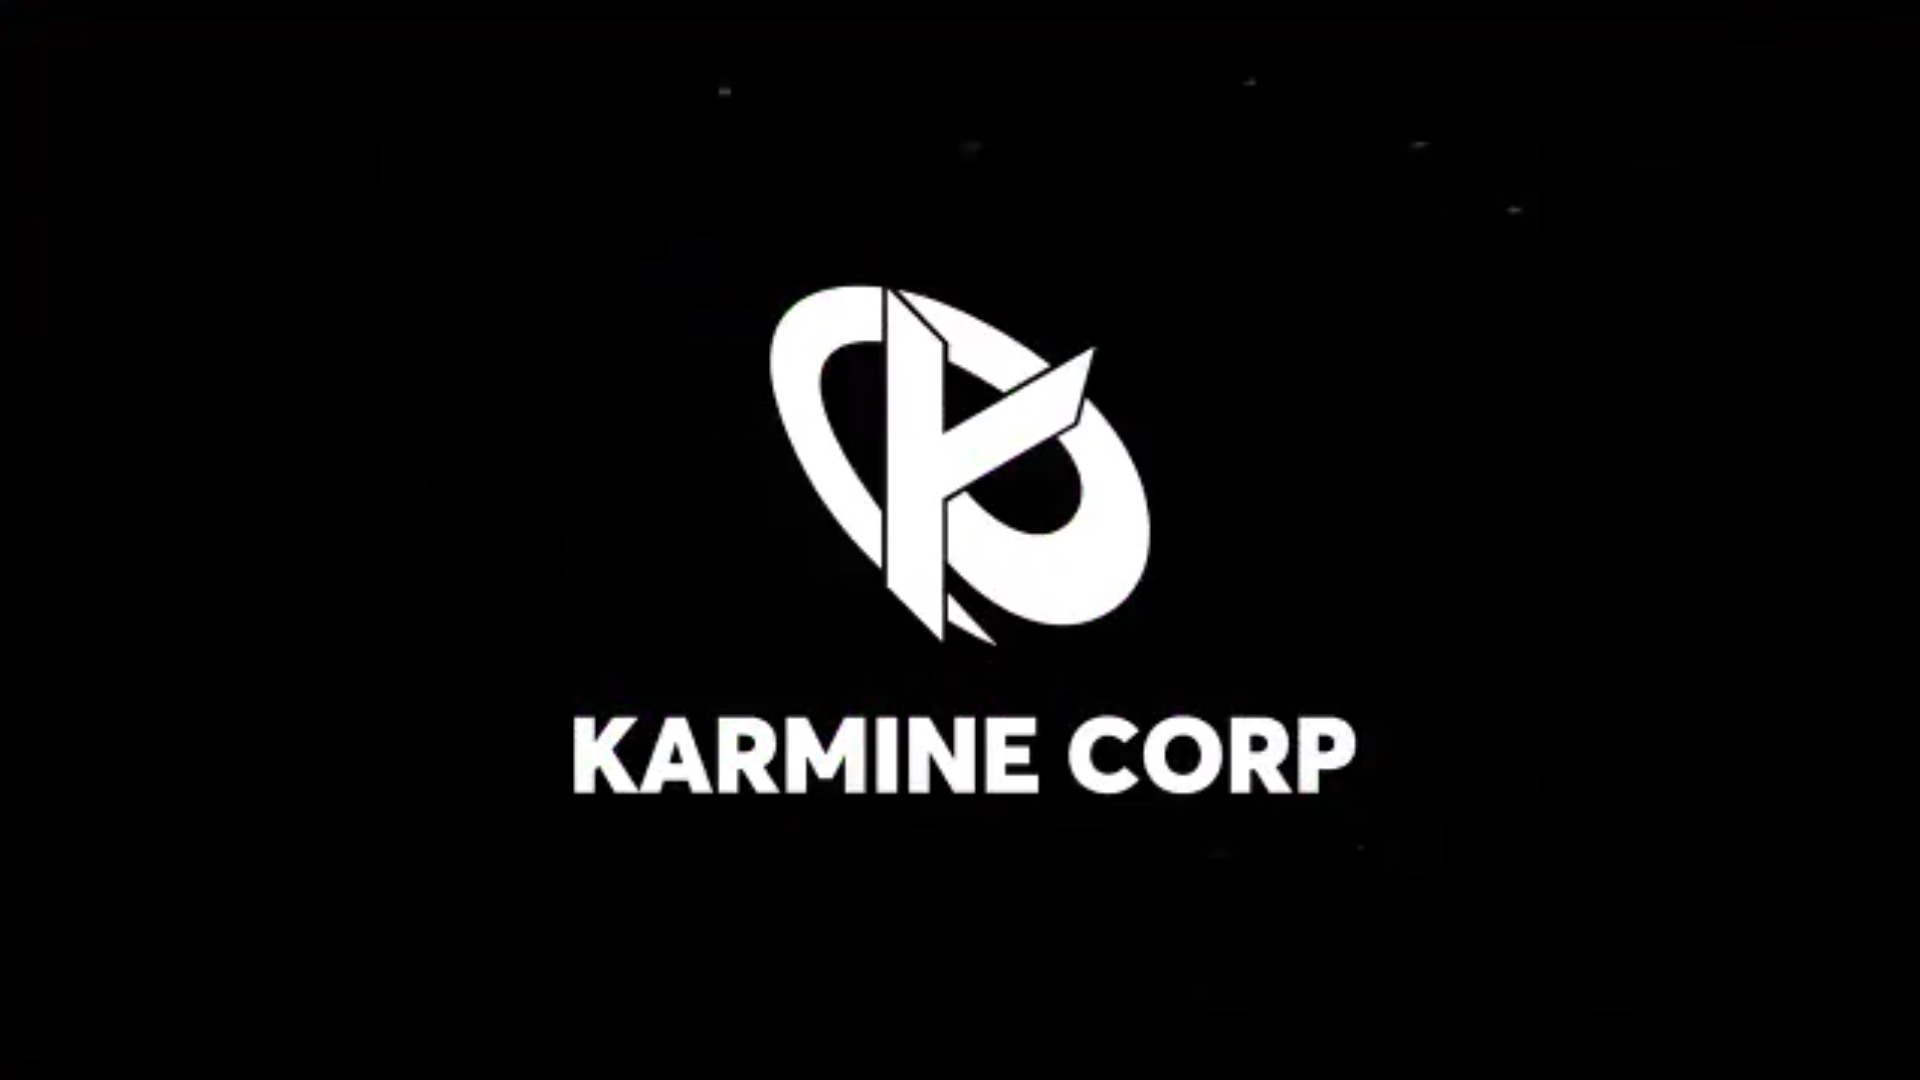 Karmine Corp